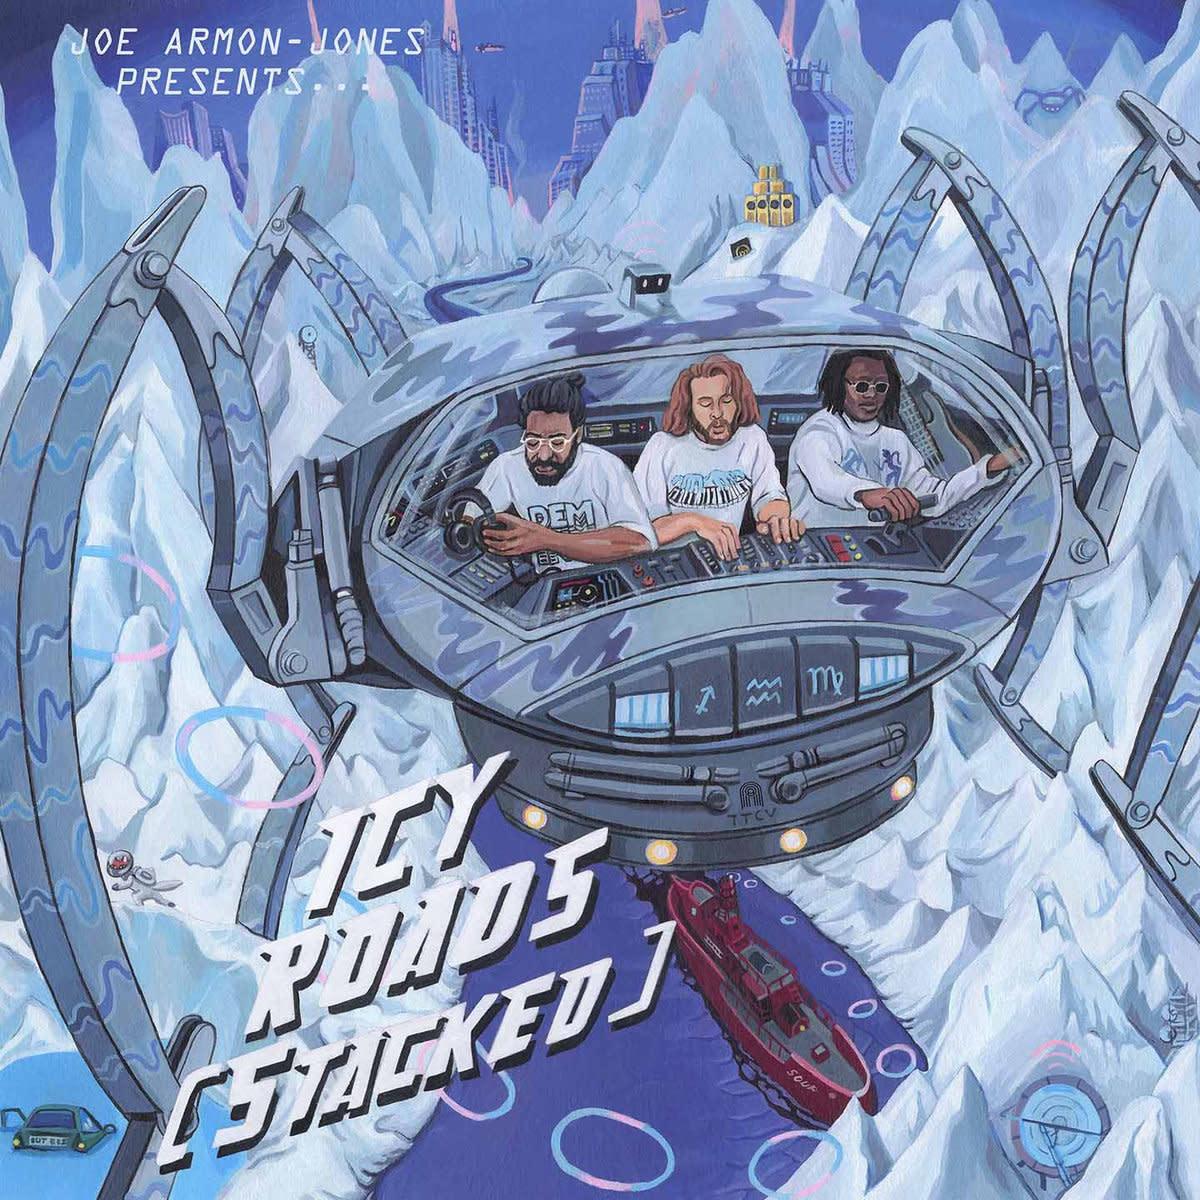 Brownswood Recordings Joe Armon-Jones - Icy Roads (Stacked)